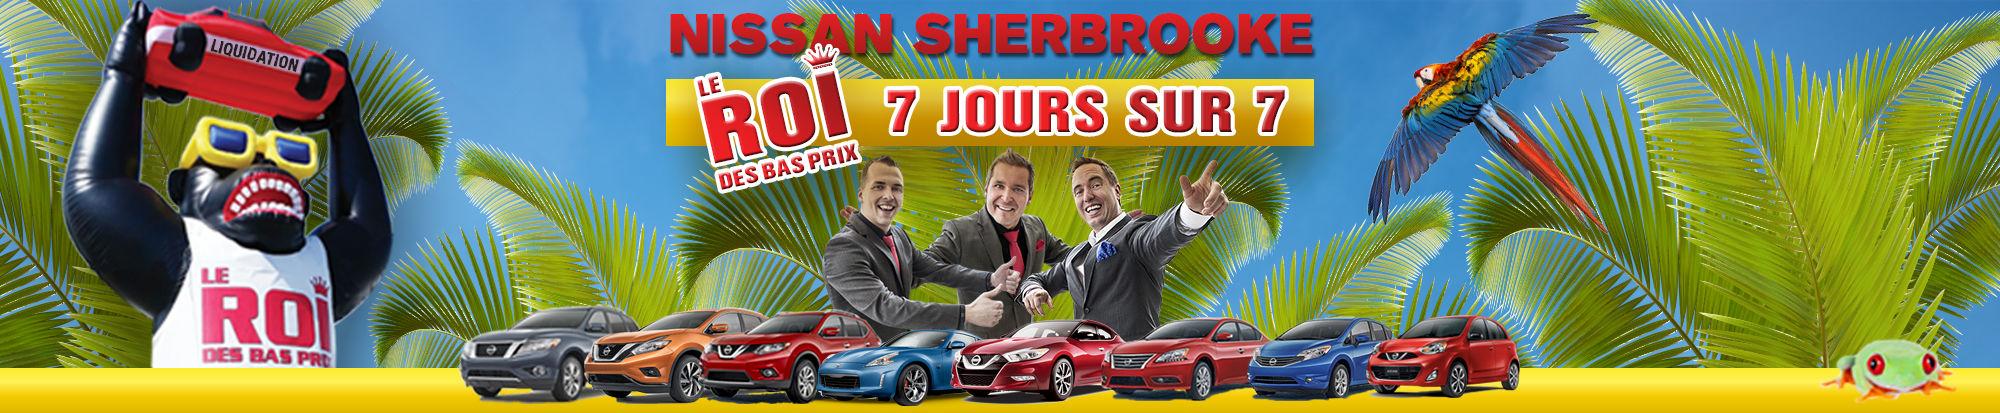 Nissan Sherbrooke le roi des bas prix